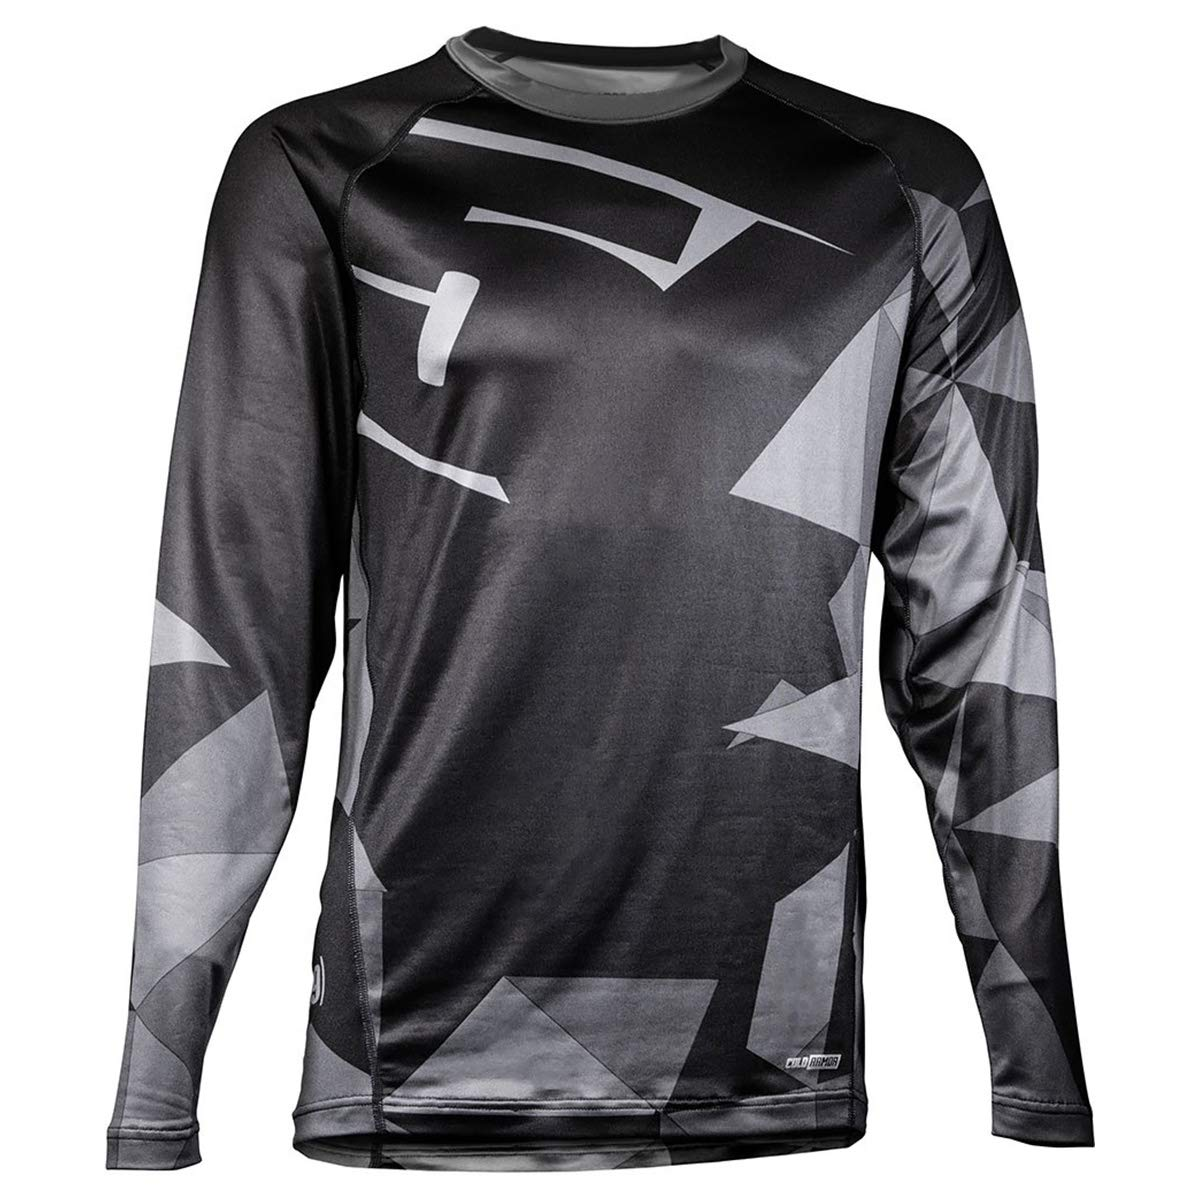 Black Ops - X-Large 509 FZN LVL 1 Shirt